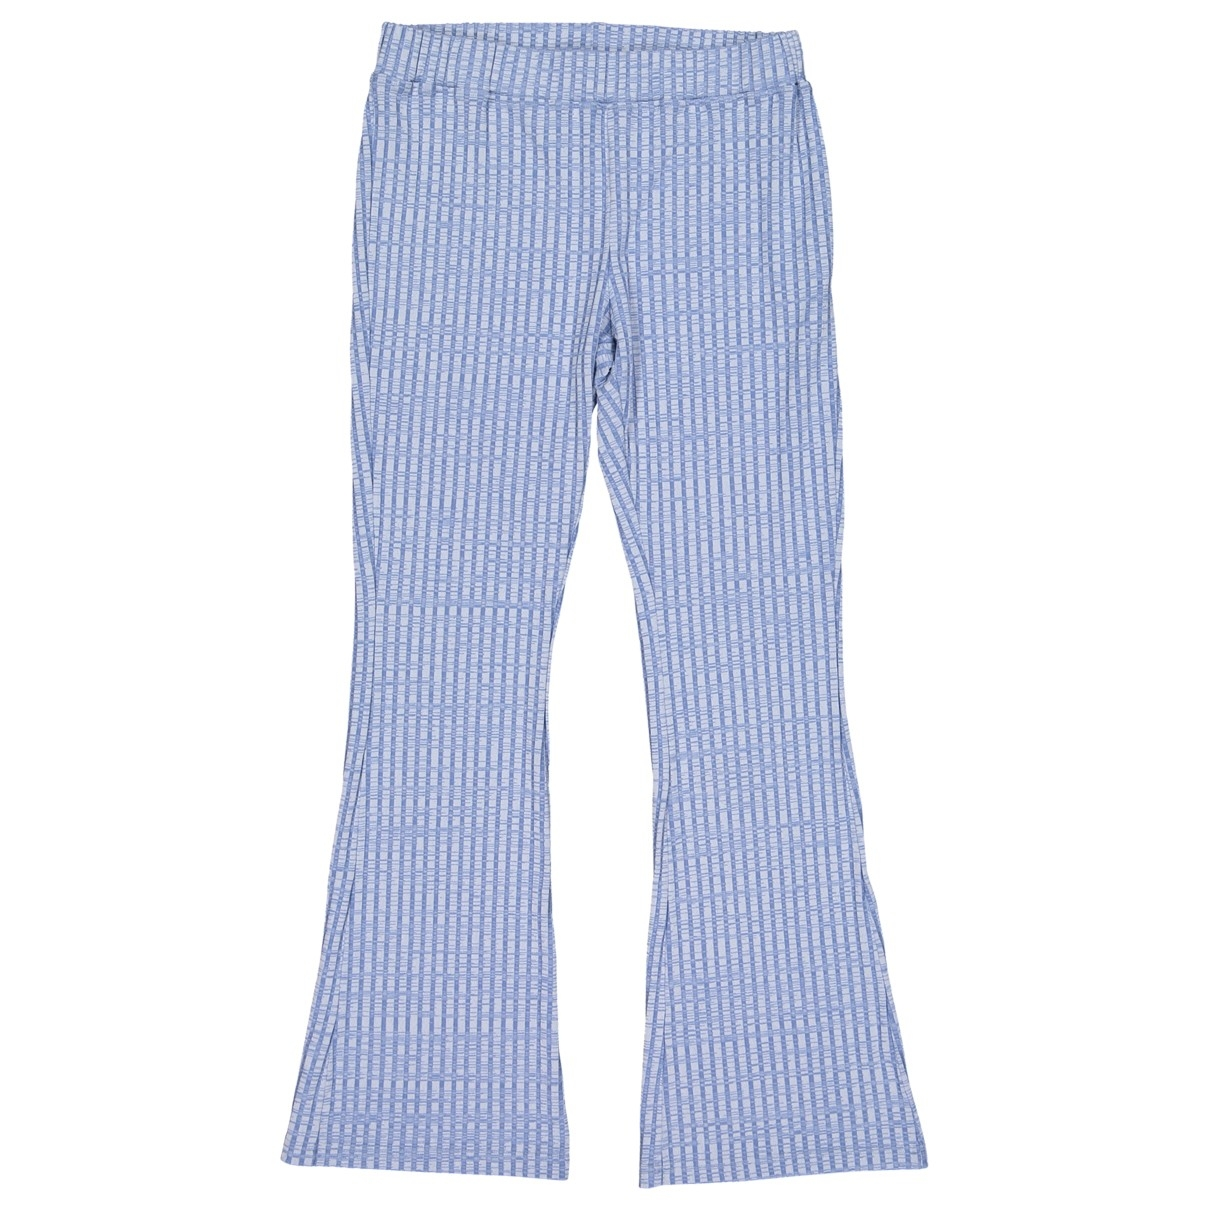 Mm6 \N Blue Cloth Trousers for Women M International